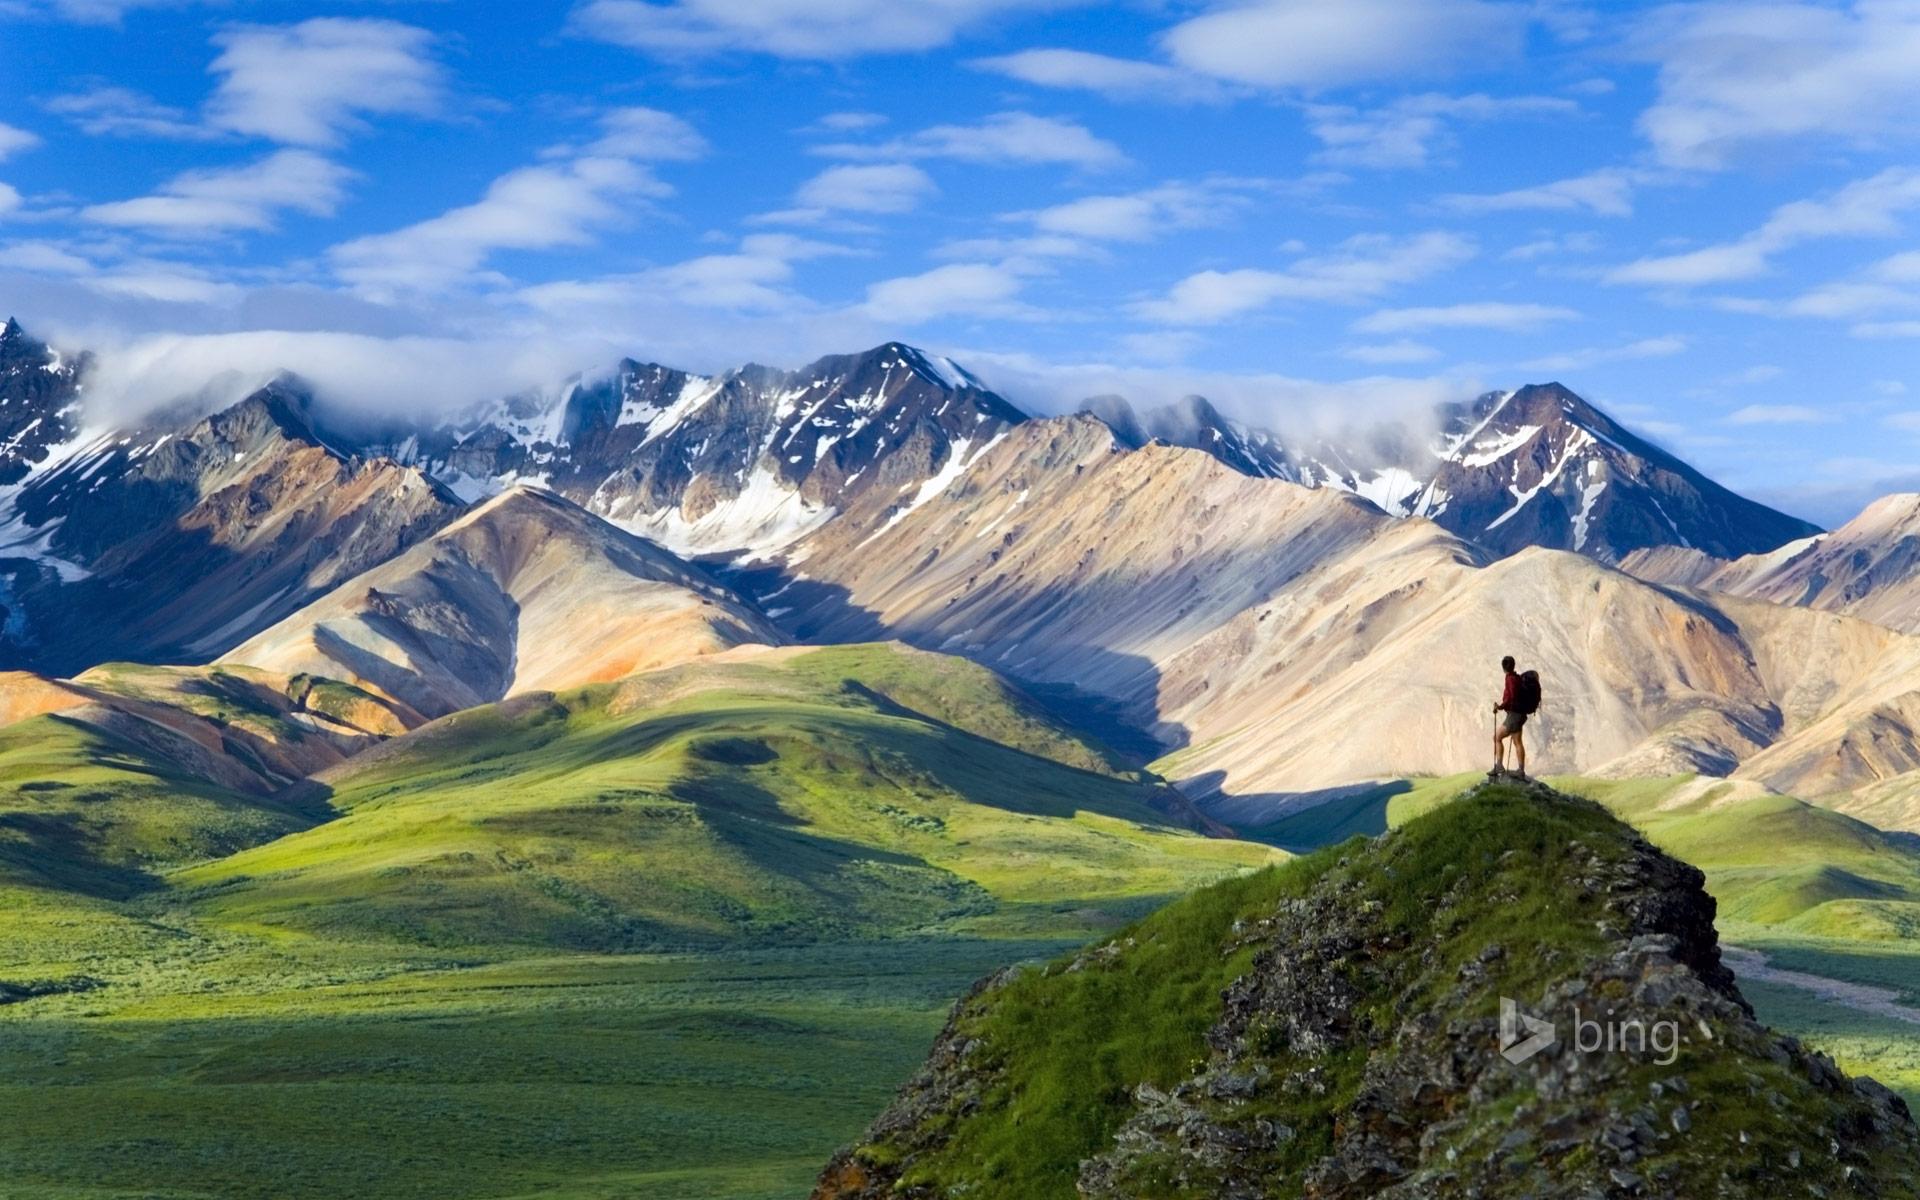 HD Wallpapers Denali National Park